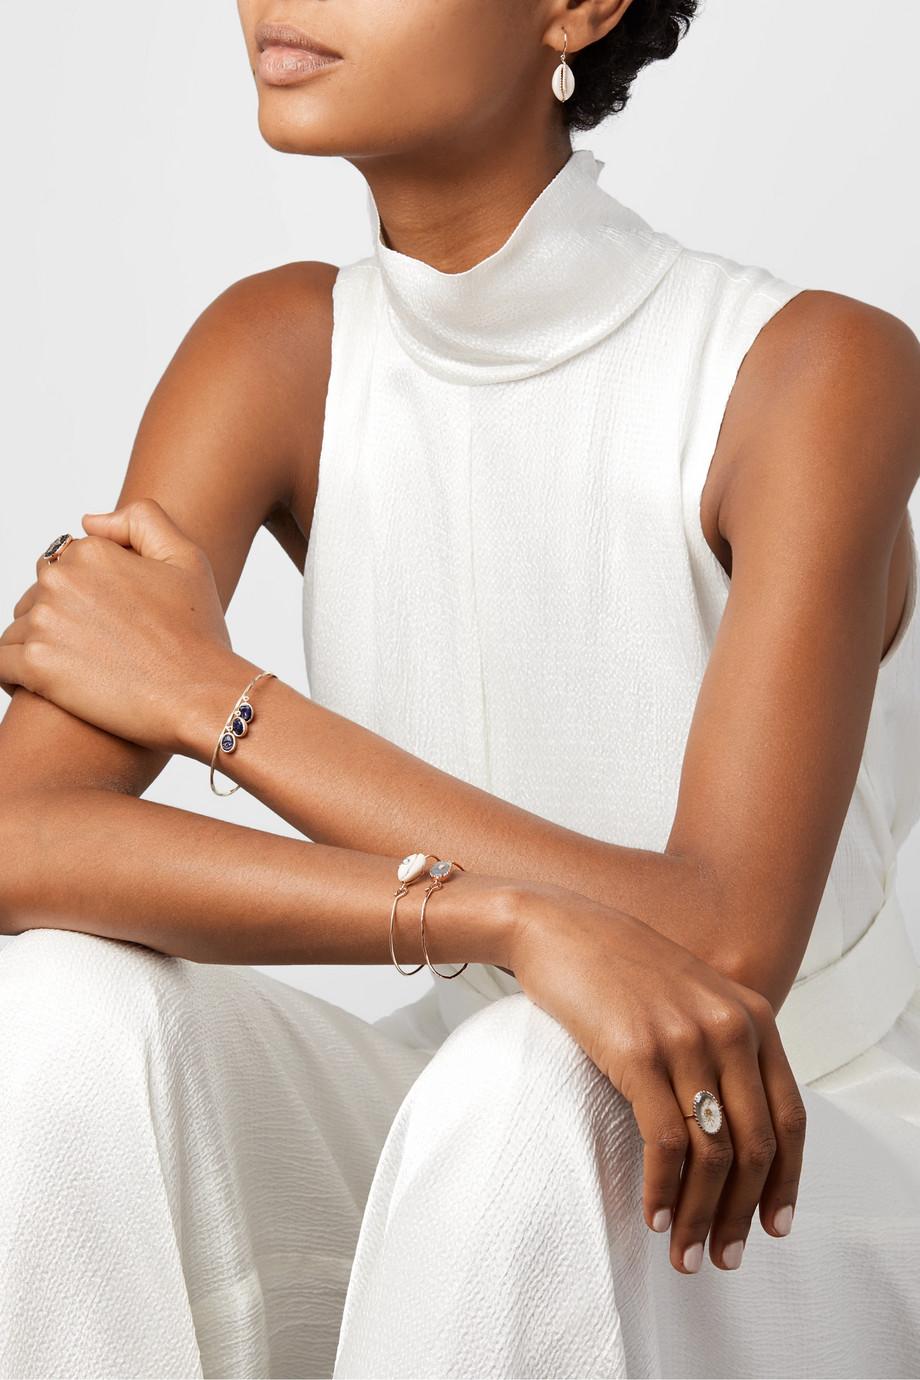 Pascale Monvoisin Orso N°1 9-karat rose gold, labradorite and diamond bracelet